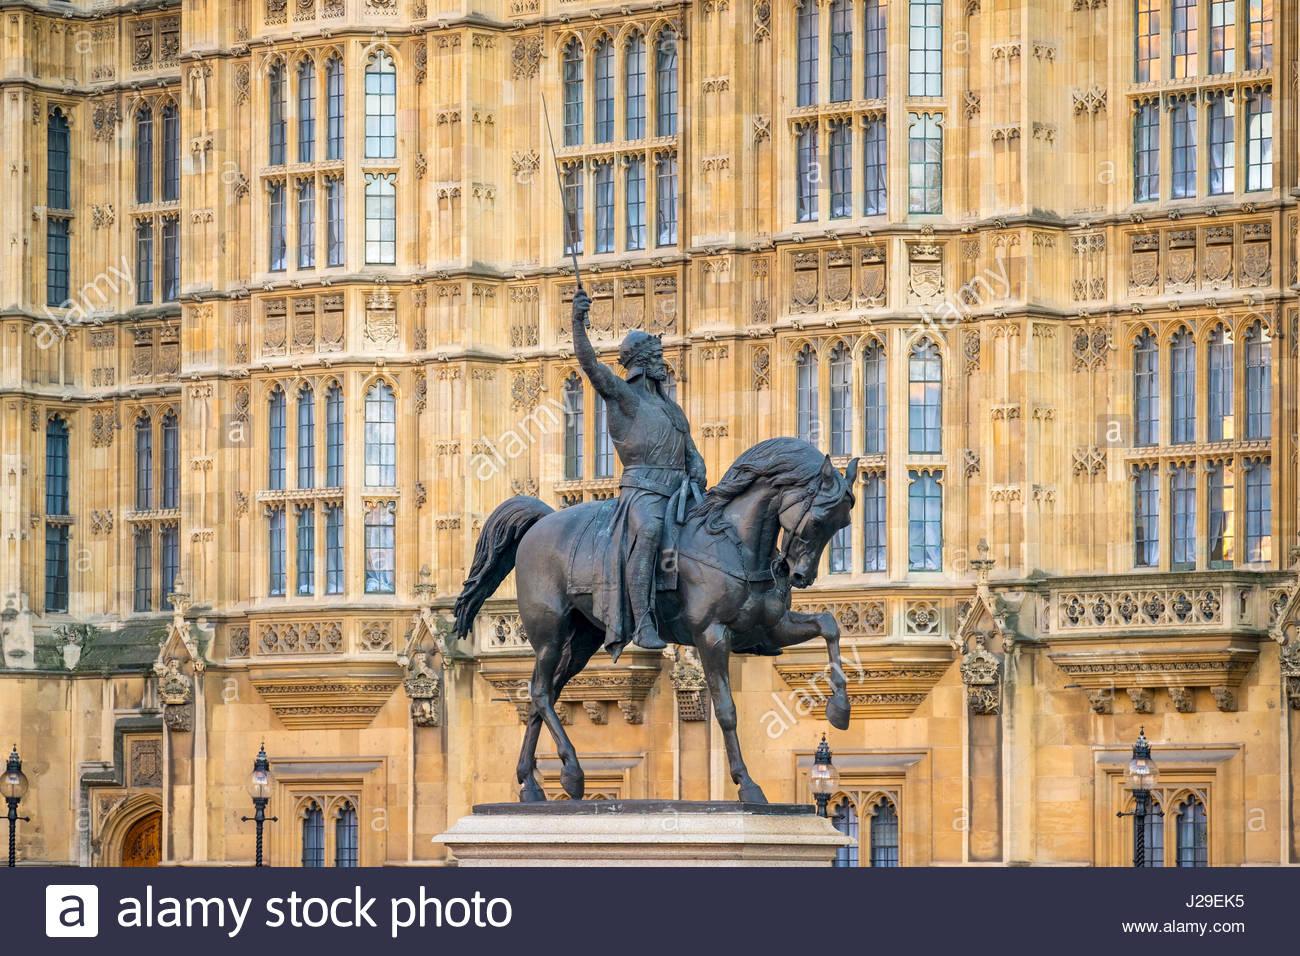 United Kingdom, England, London. Richard Coeur de Lion, statue of Richard I (Richard the Lionheart) in Old Palace - Stock Image